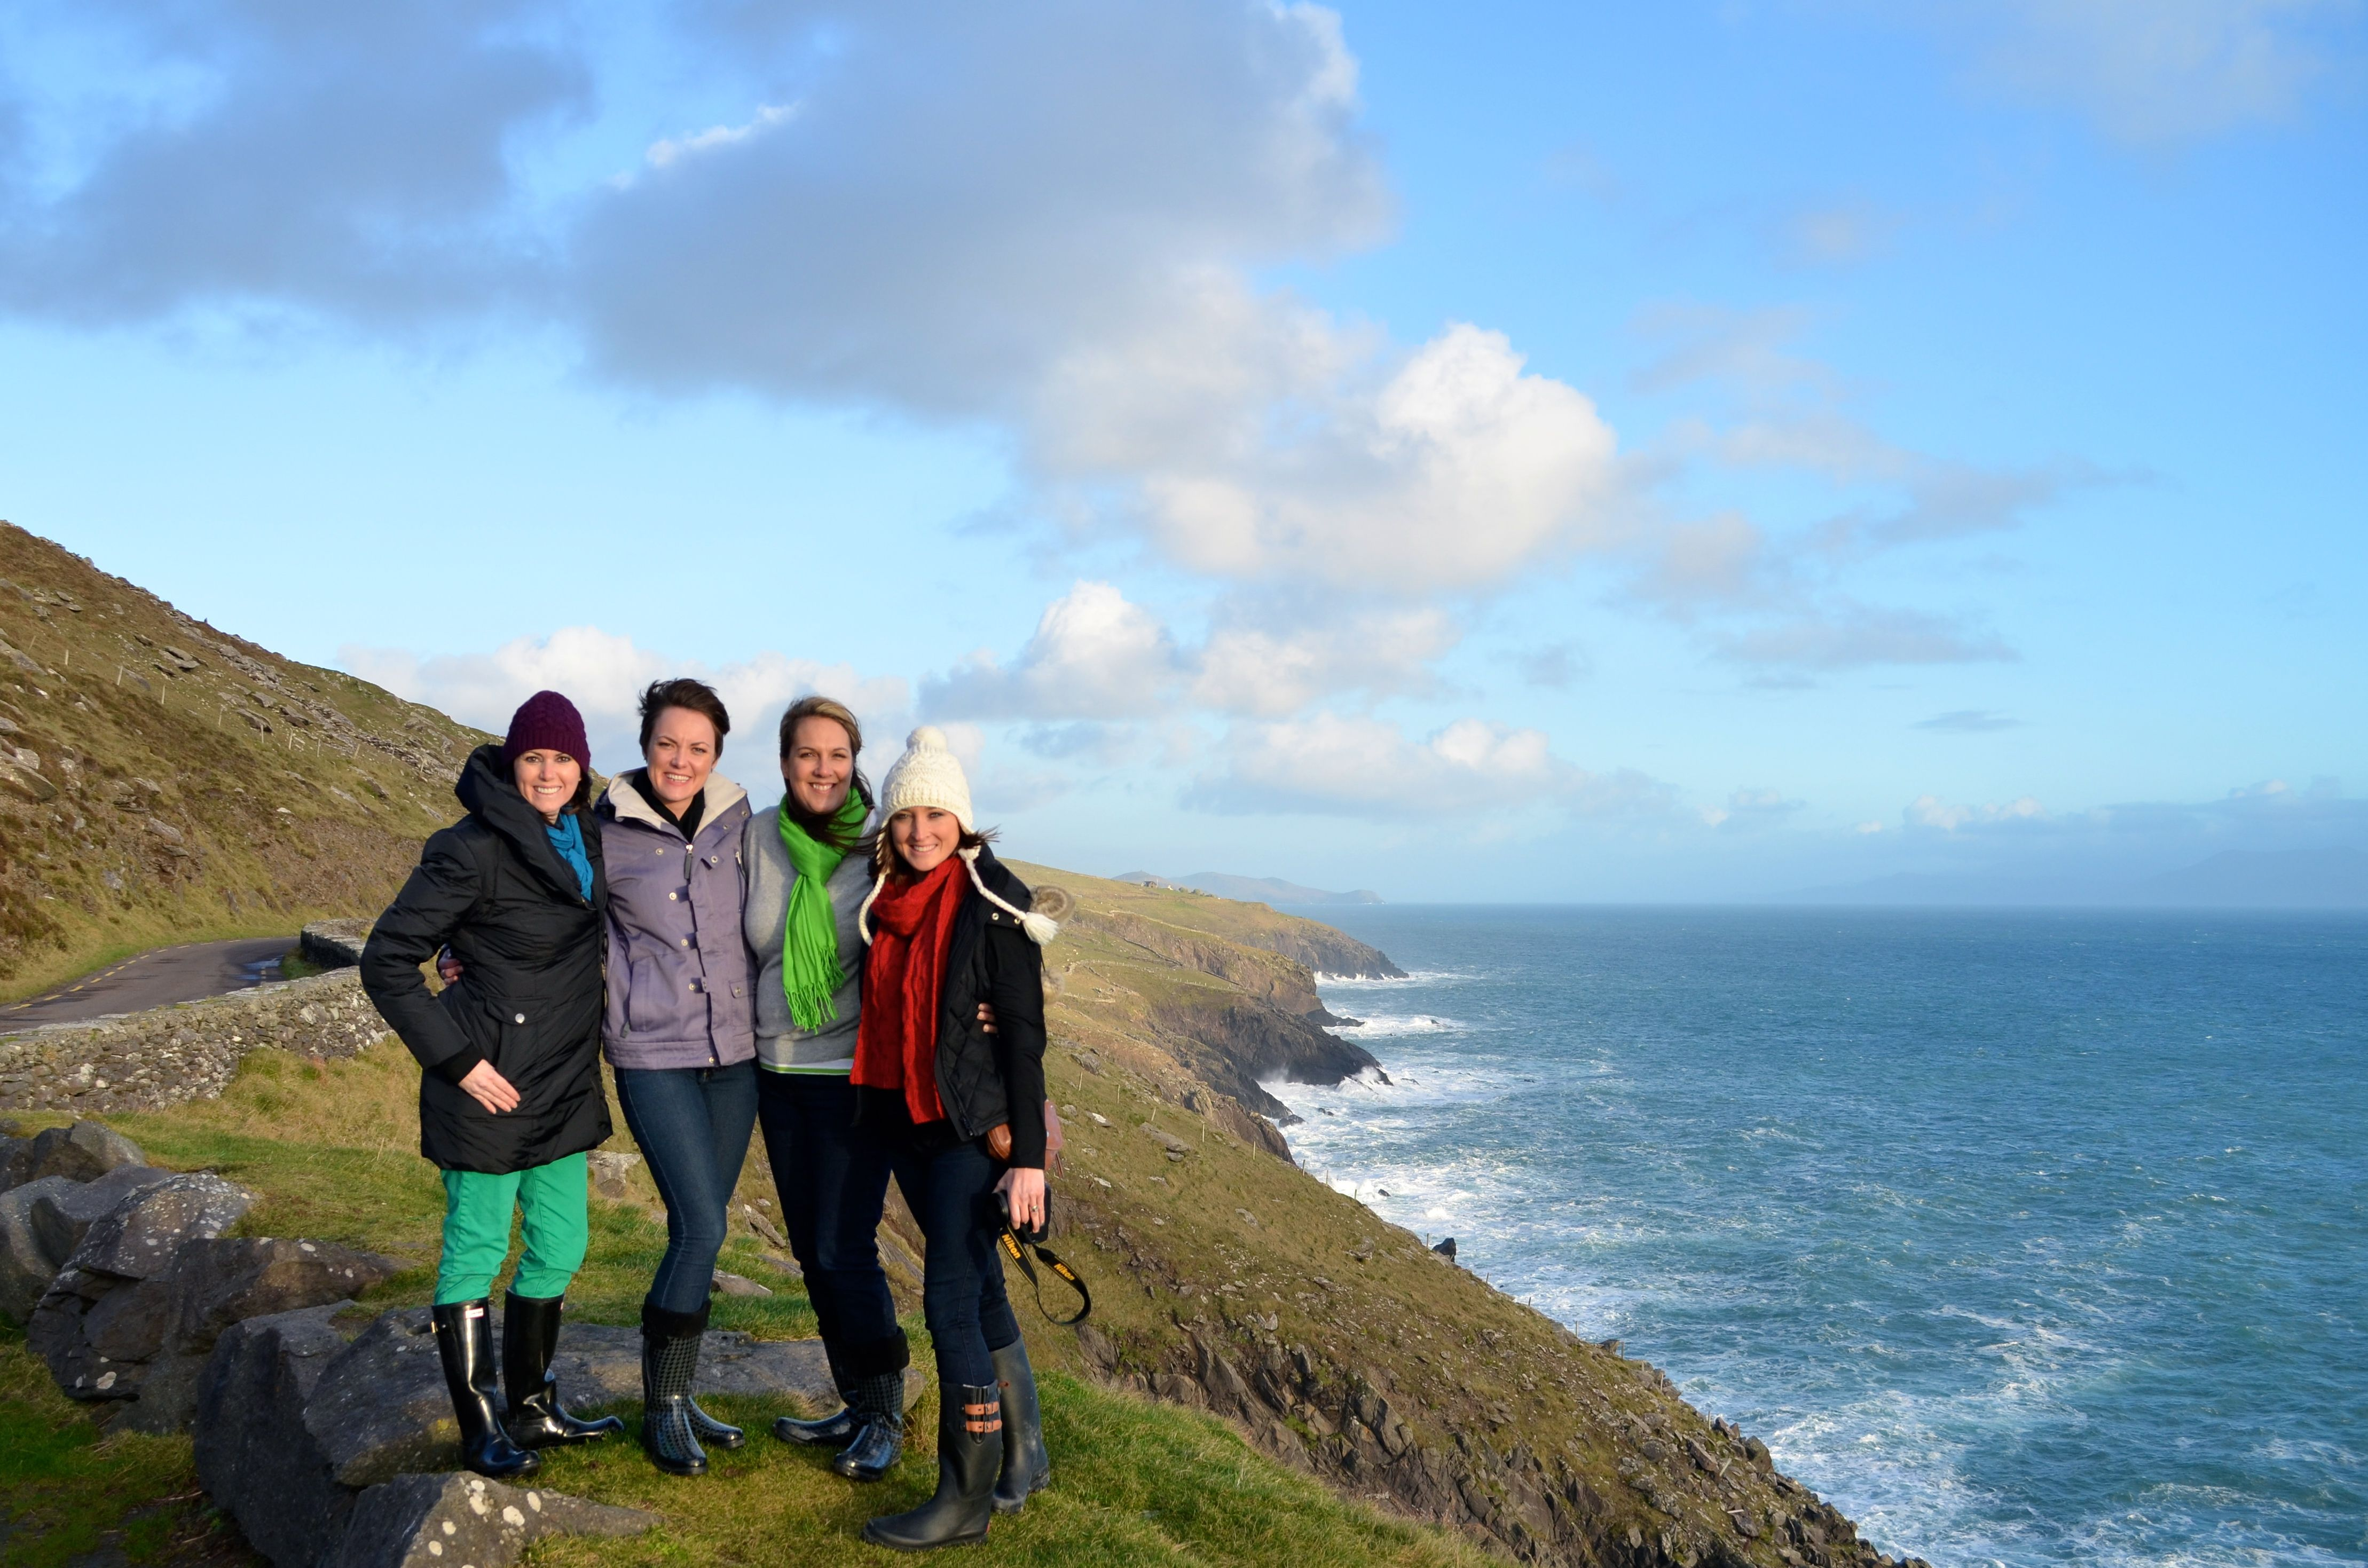 Dingle BayIrelandTravelEurope My Dream Vacation Pinterest - Irish vacations